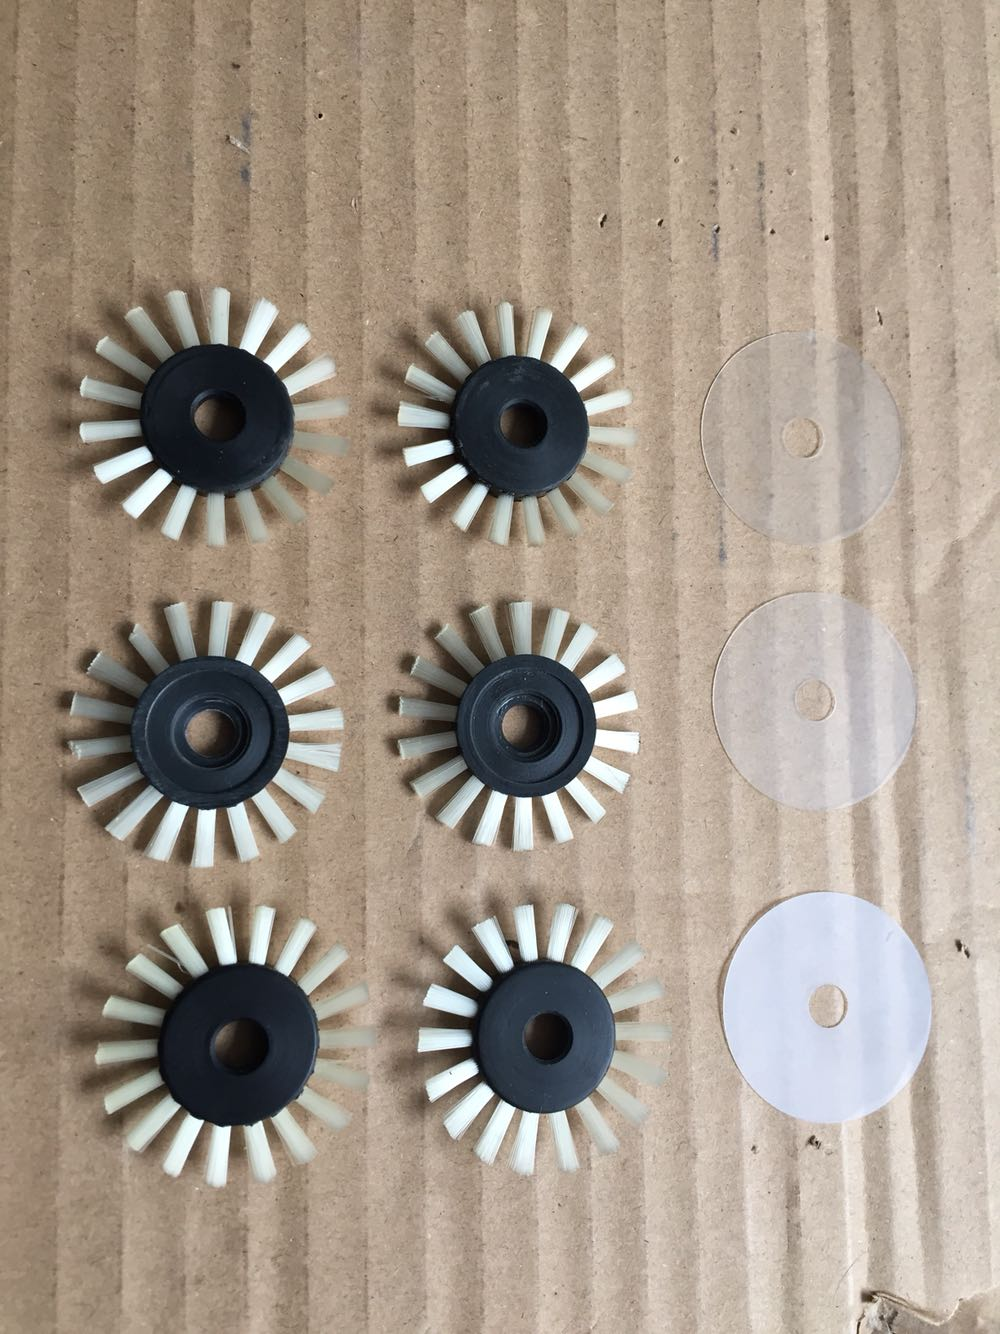 4PCS New Weaving Brush For Silver Reed/Singer Knitting Machine Accessories Sk270 Sk280 Sk840 Sk580 SK360 Sk325 SK322